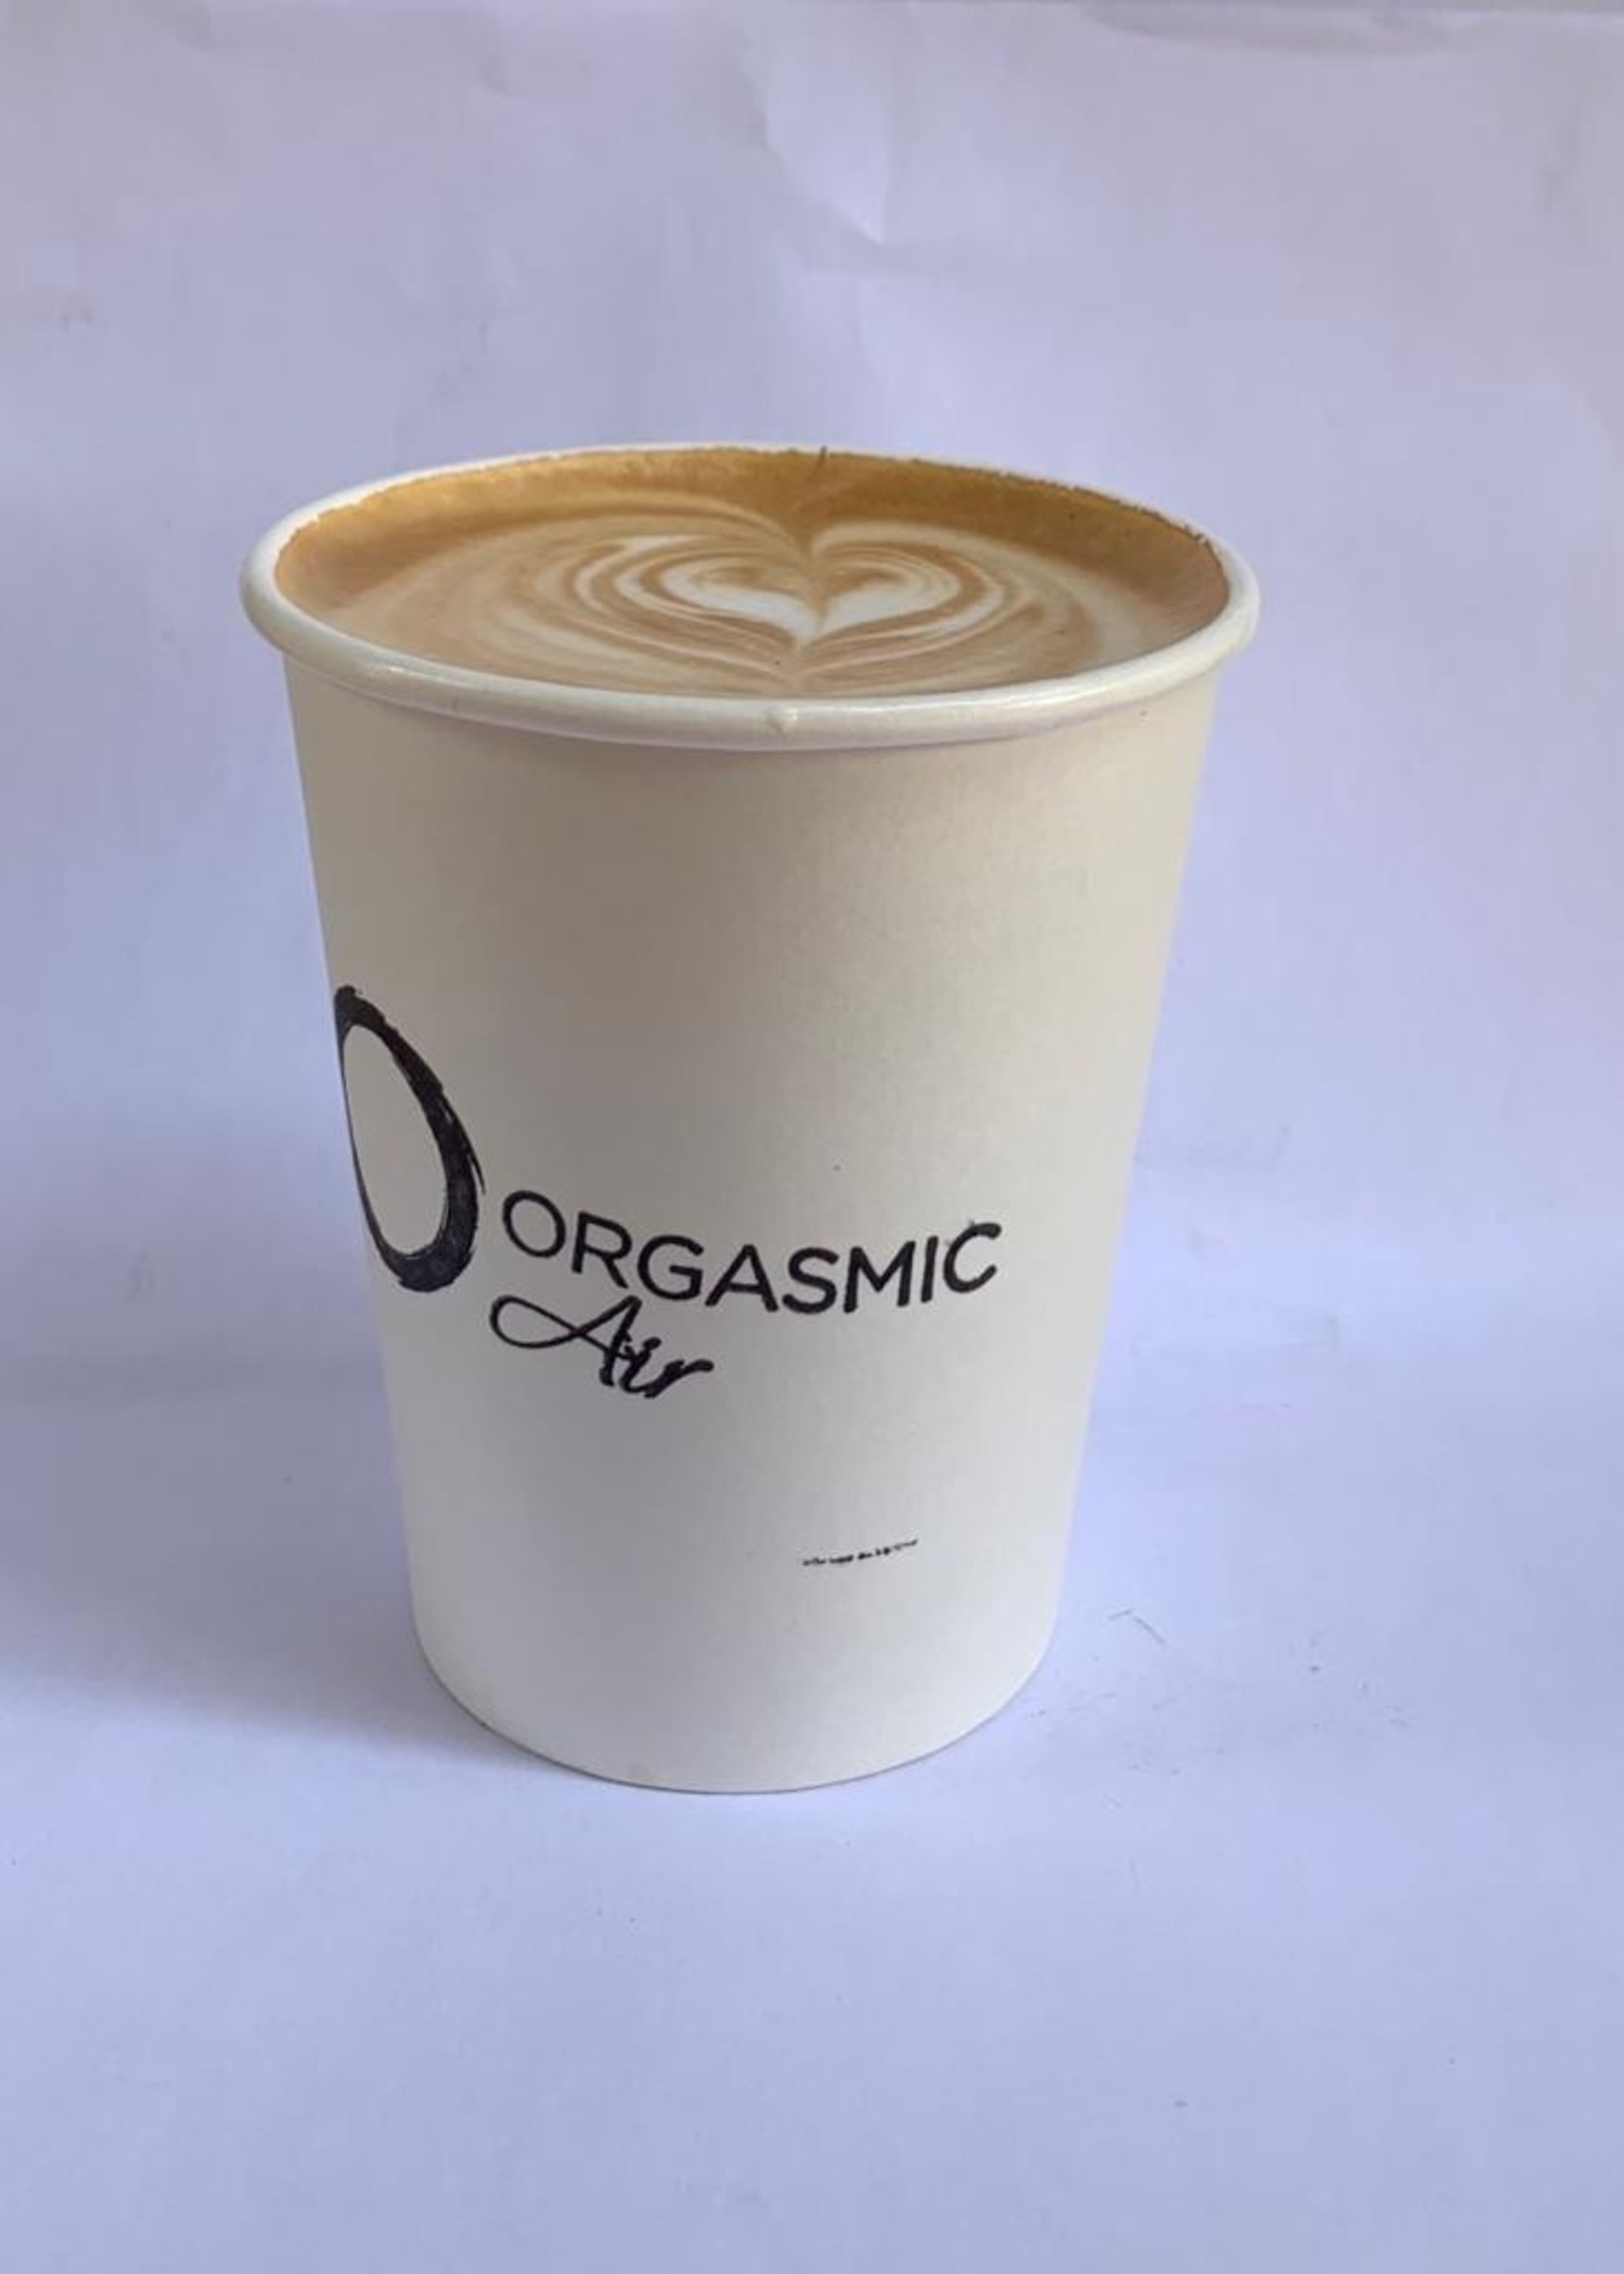 Organic & Air Caramel cappuccino